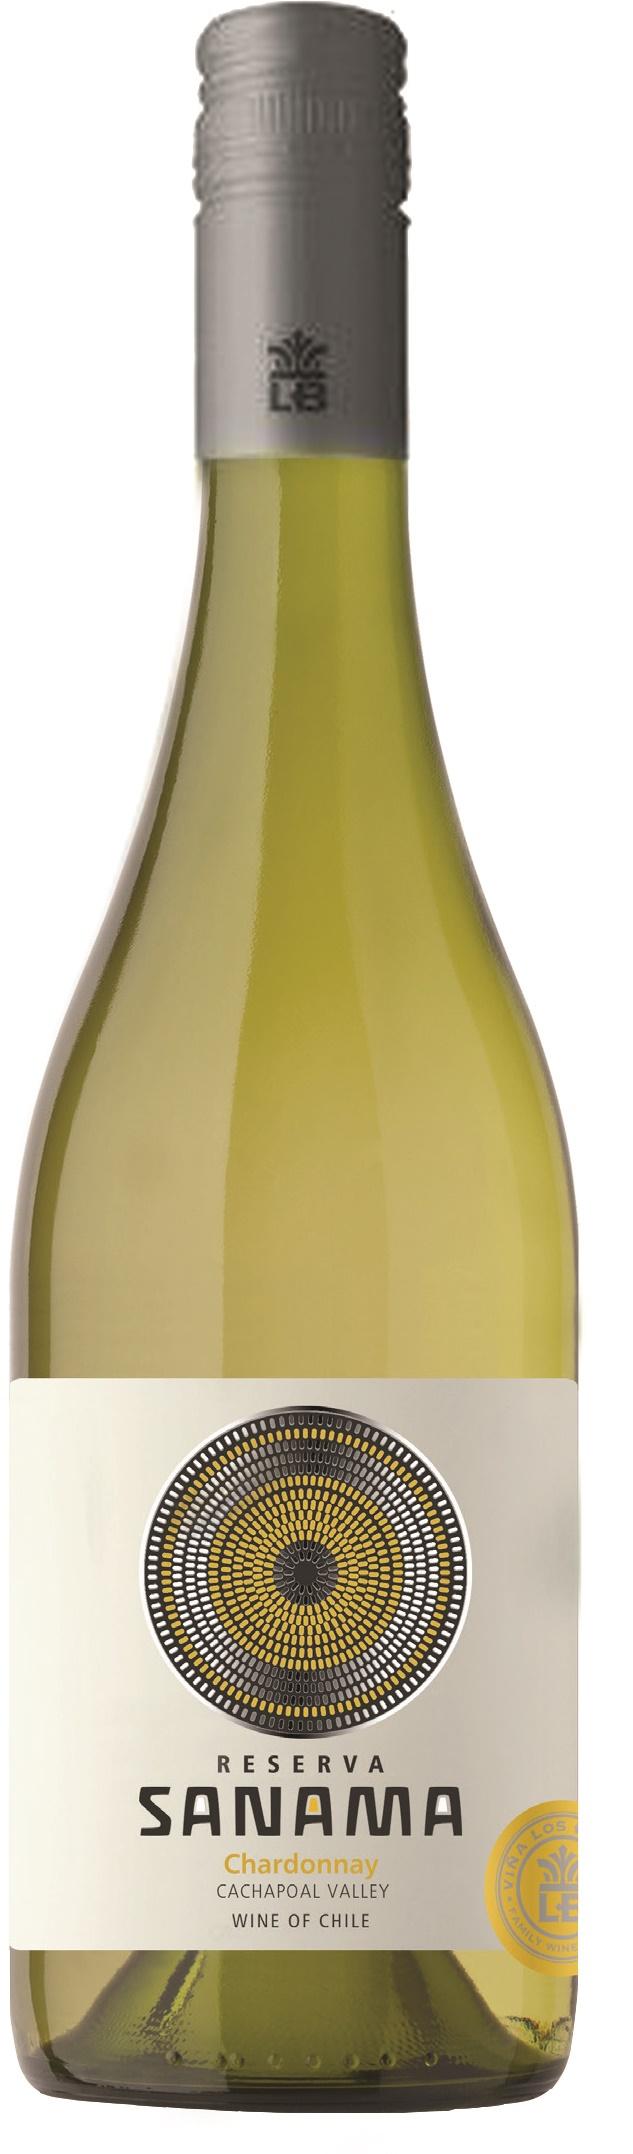 Sanama Reserva, Cachapoal Andes Chardonnay 2016